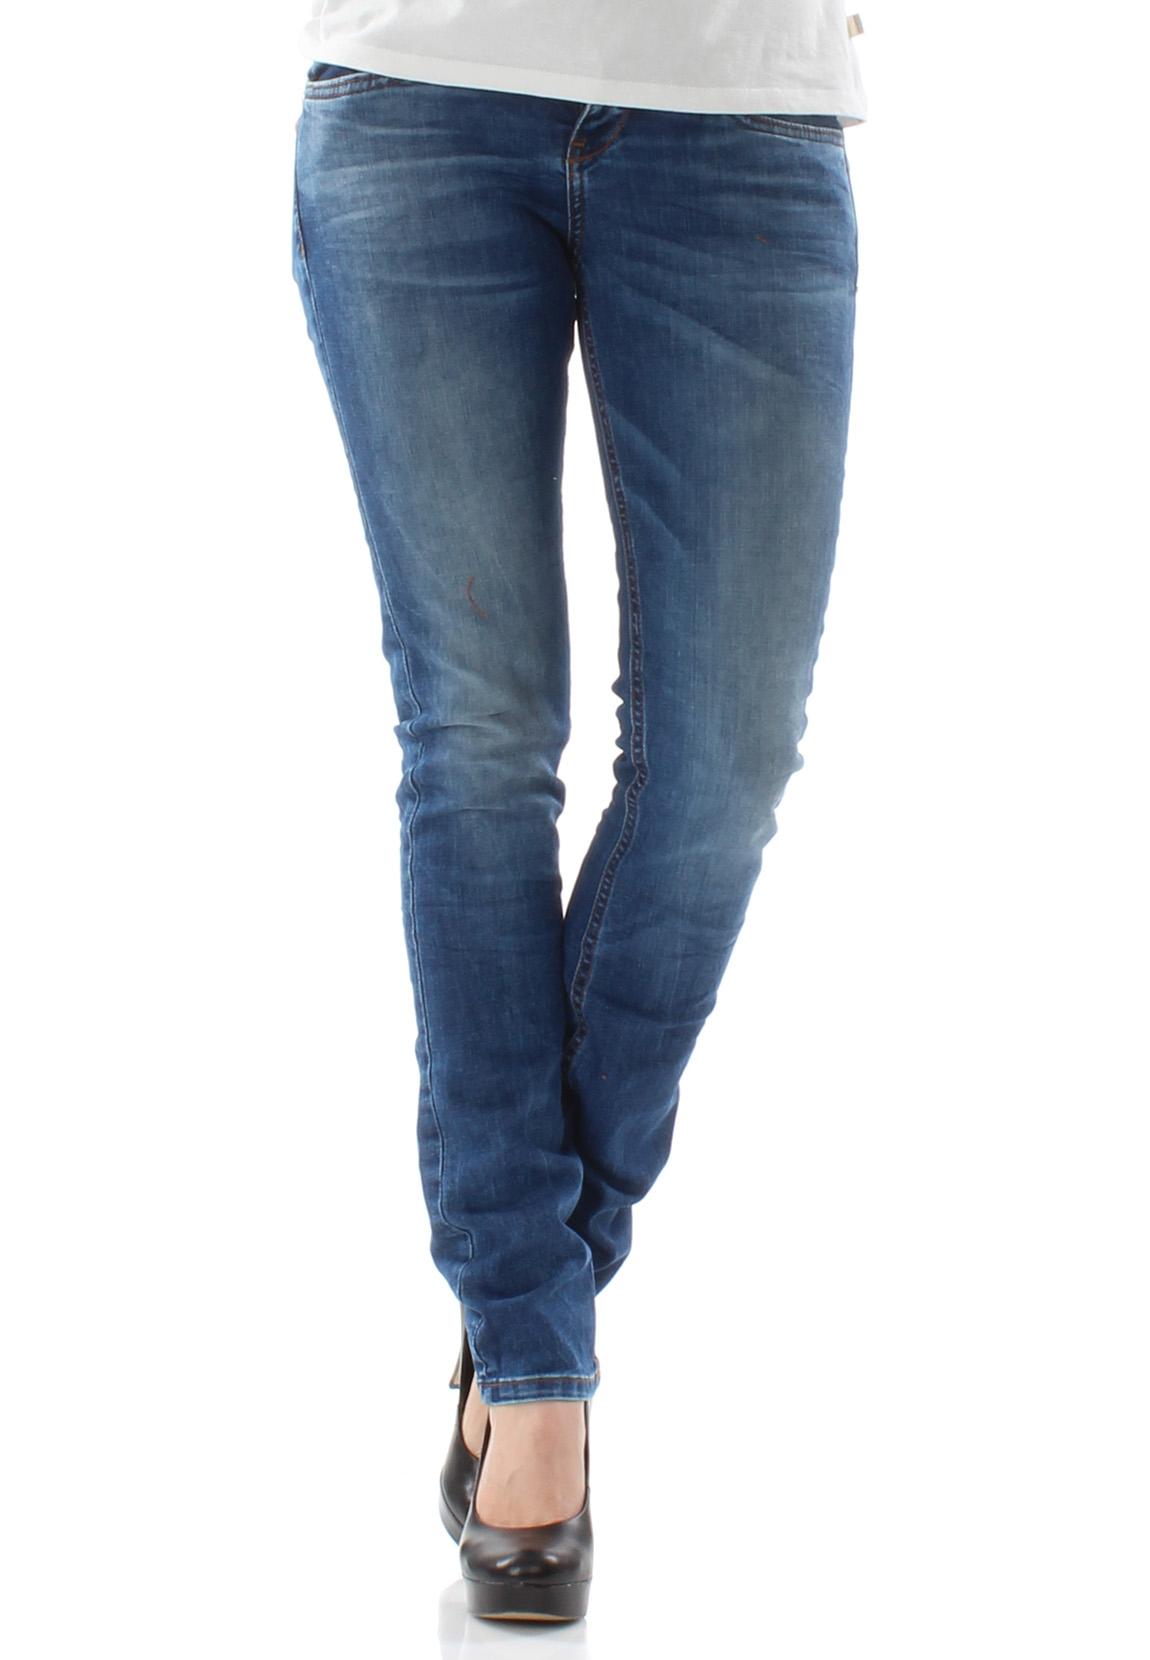 ltb jeans damen aspen angellis wash blau damen jeans hosen. Black Bedroom Furniture Sets. Home Design Ideas